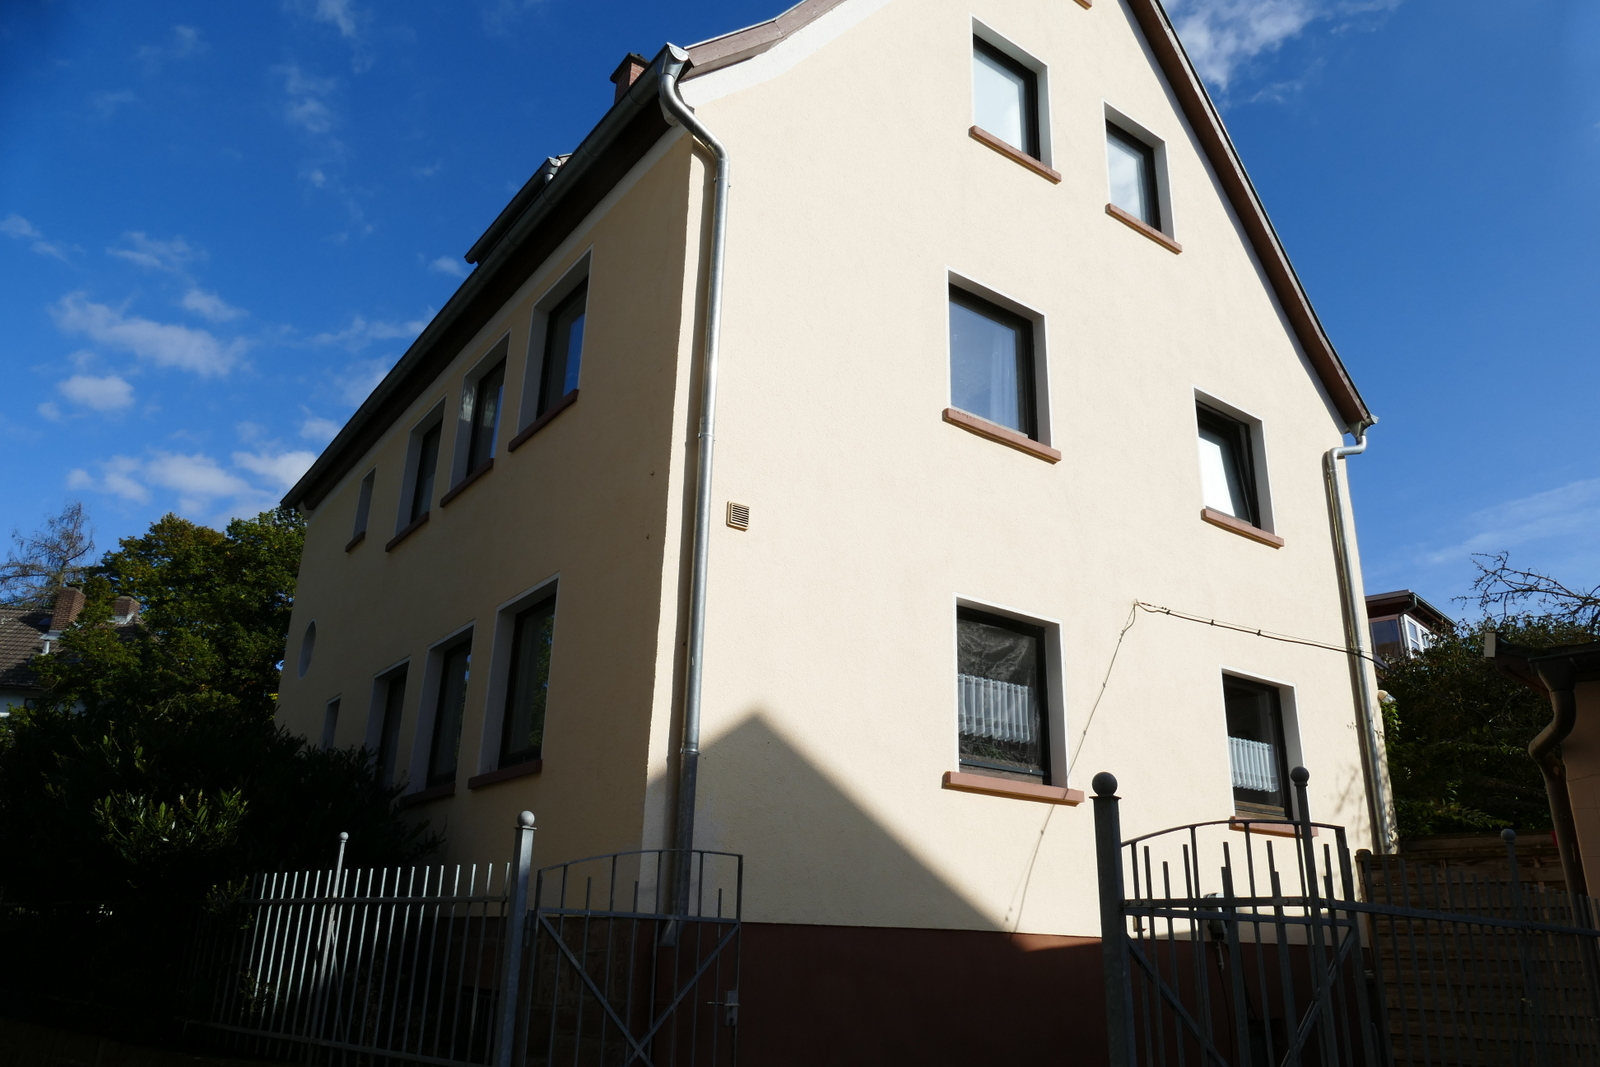 Kinderhaus Ginseldorf der Jugendheim Marbach gGmbH